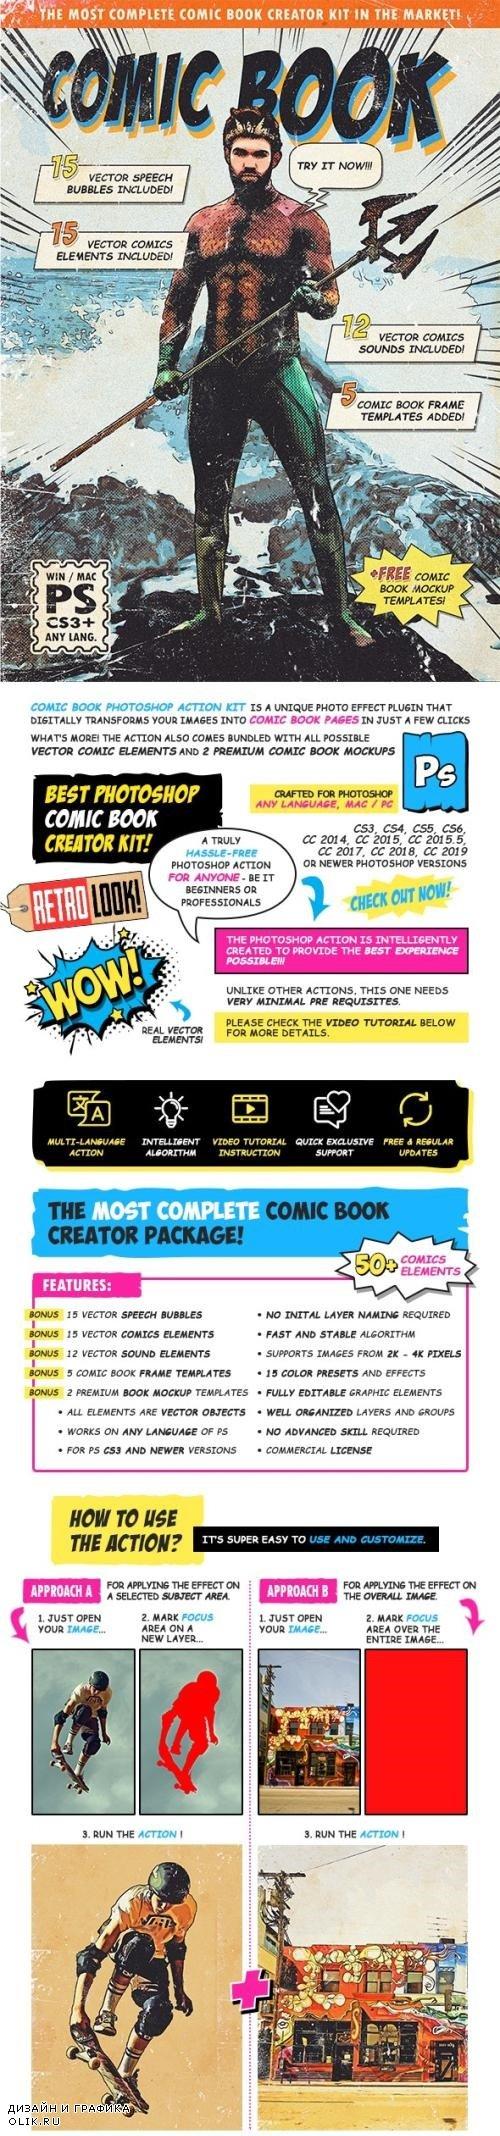 Retro Comic Book Photoshop Action Kit 24379894